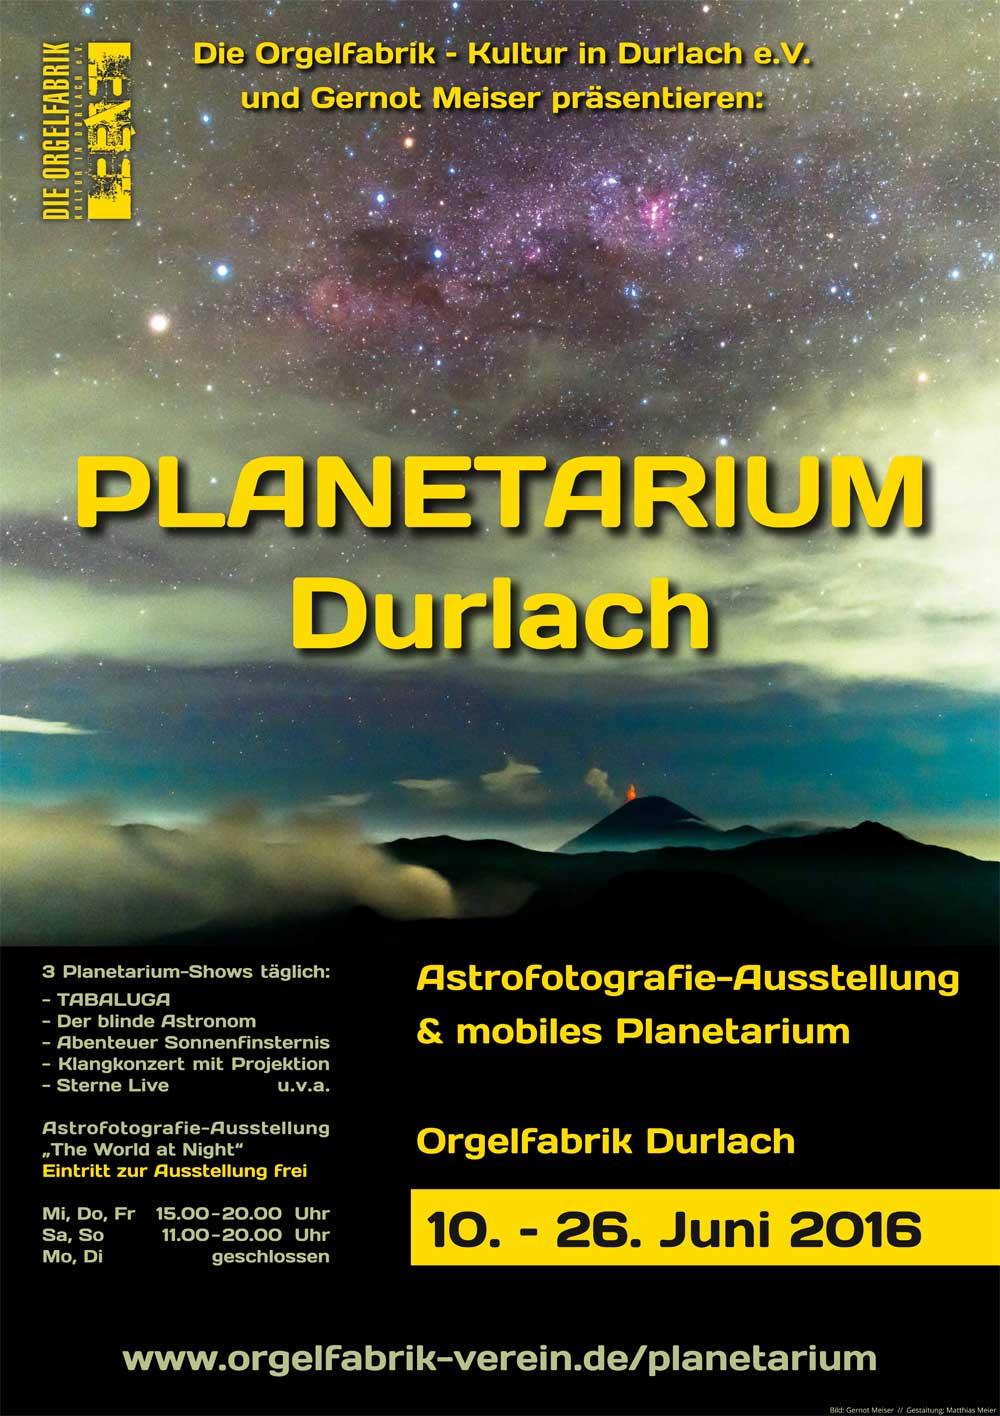 http://www.orgelfabrik-verein.de/wp-content/uploads/2016/05/Planetarium-Plakat_JPEG_web.jpg